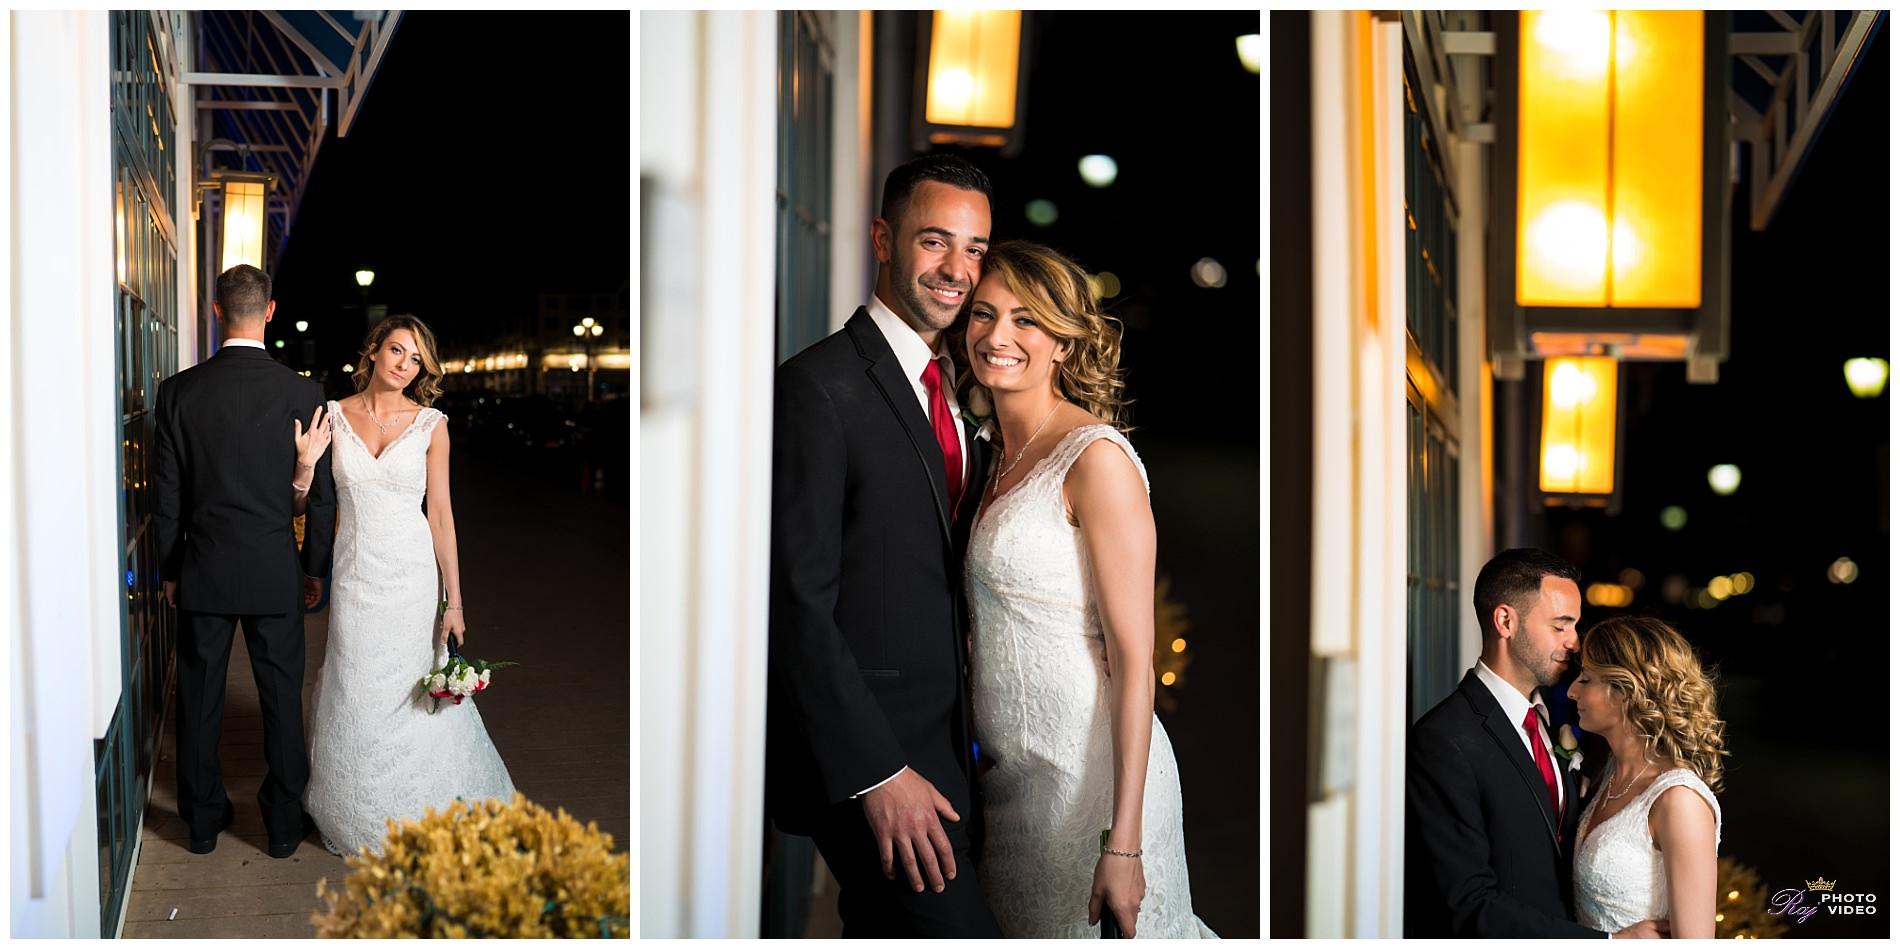 McLoones-Pier-House-Long-Branch-NJ-Wedding-Geraldine-Daniel-17.jpg